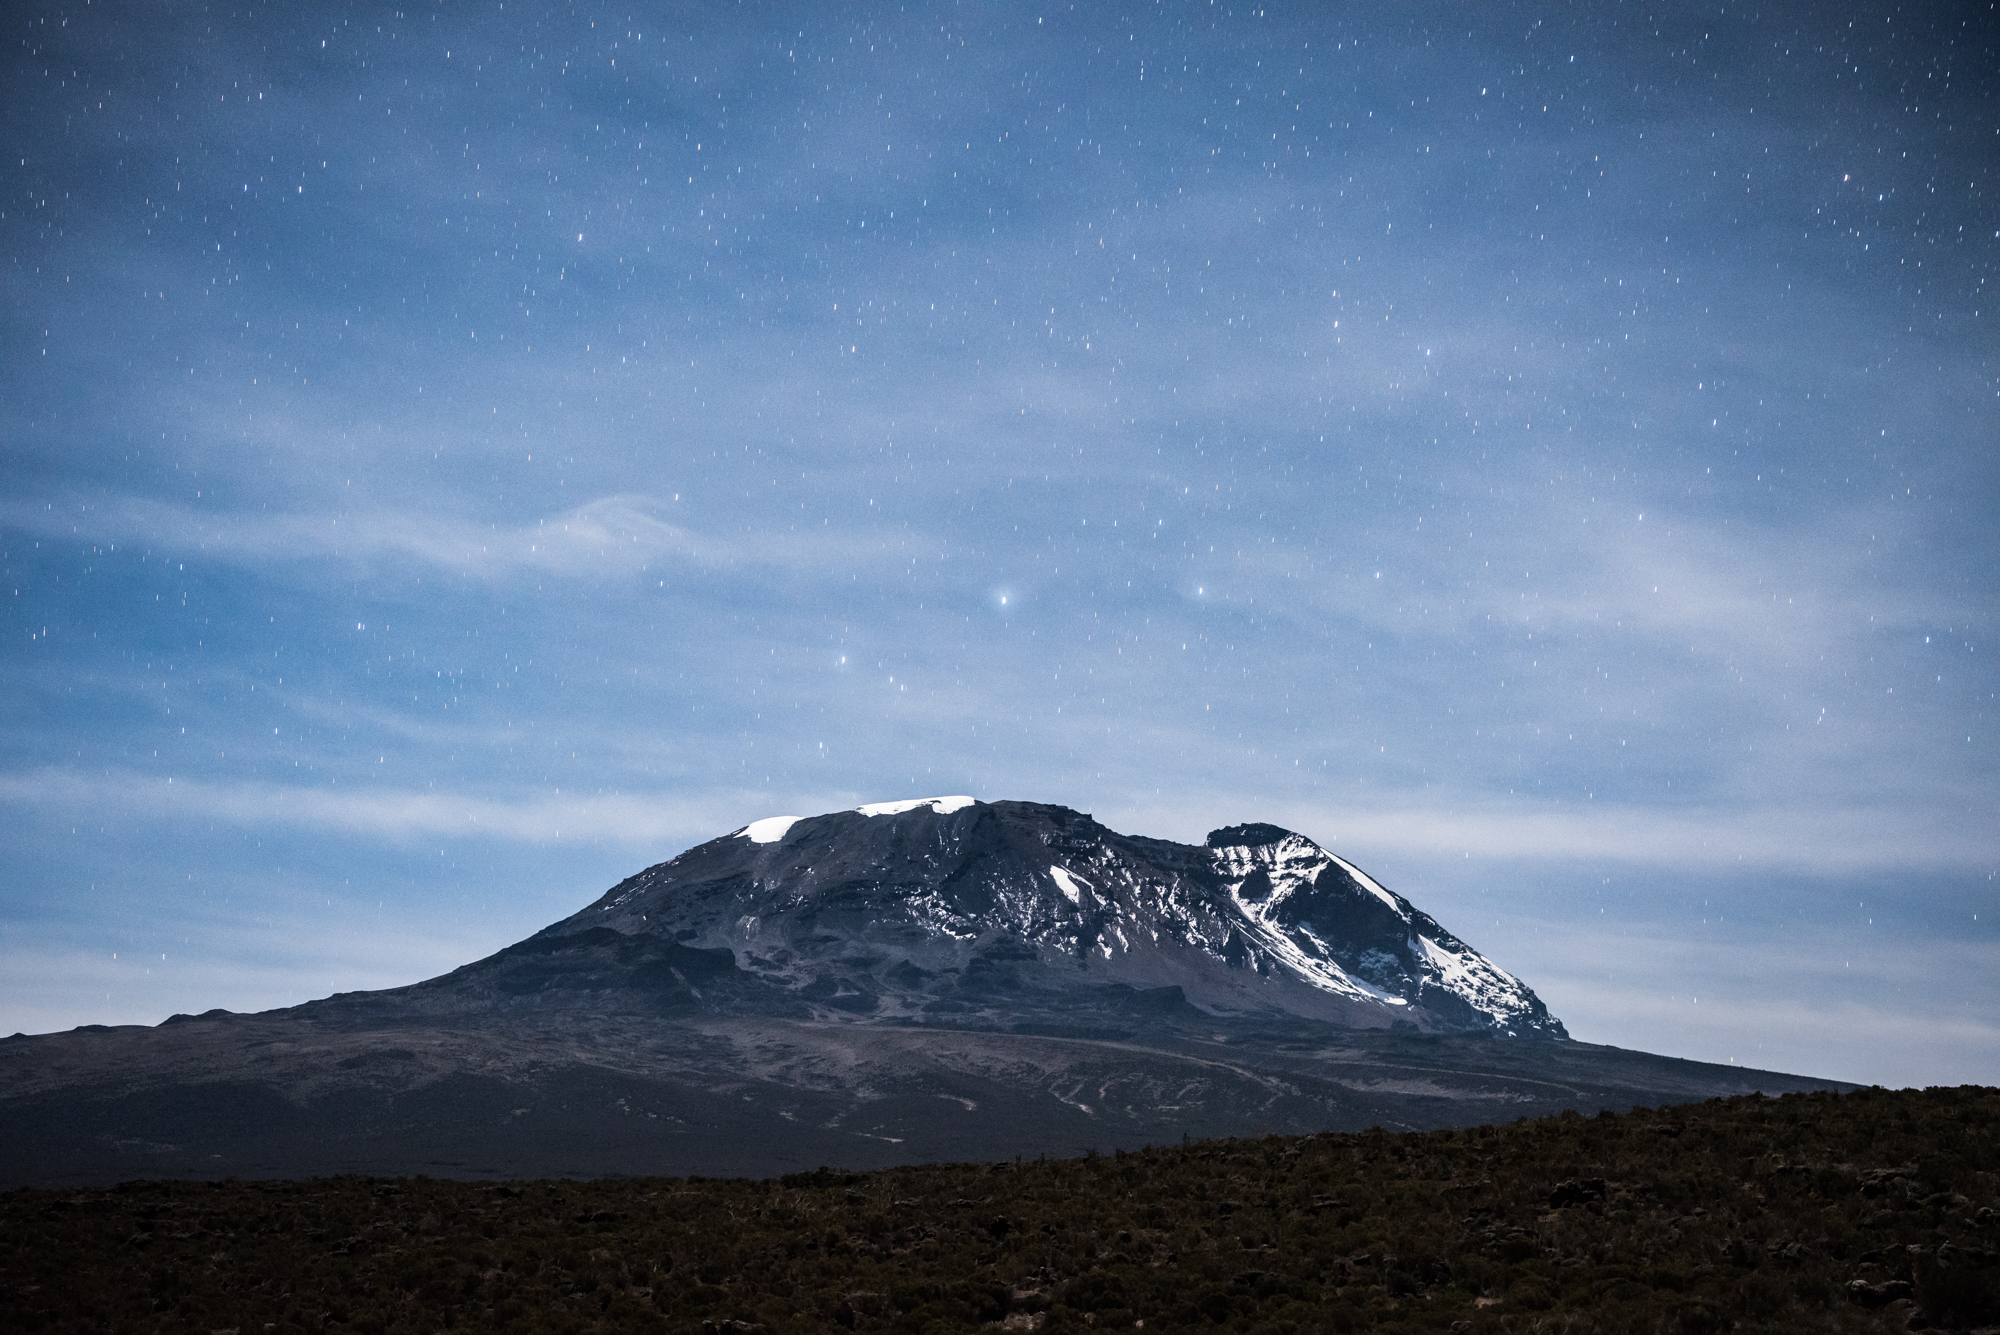 Mount Kilimanjaro under the Big Dipper, photo credit to Taylor Glenn